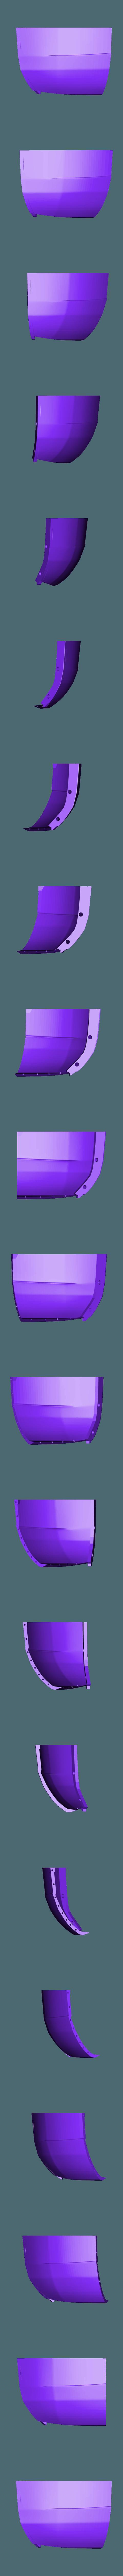 Top right 1.stl Download STL file Iron Man Mark 42  • 3D printing object, SKUPERDIY